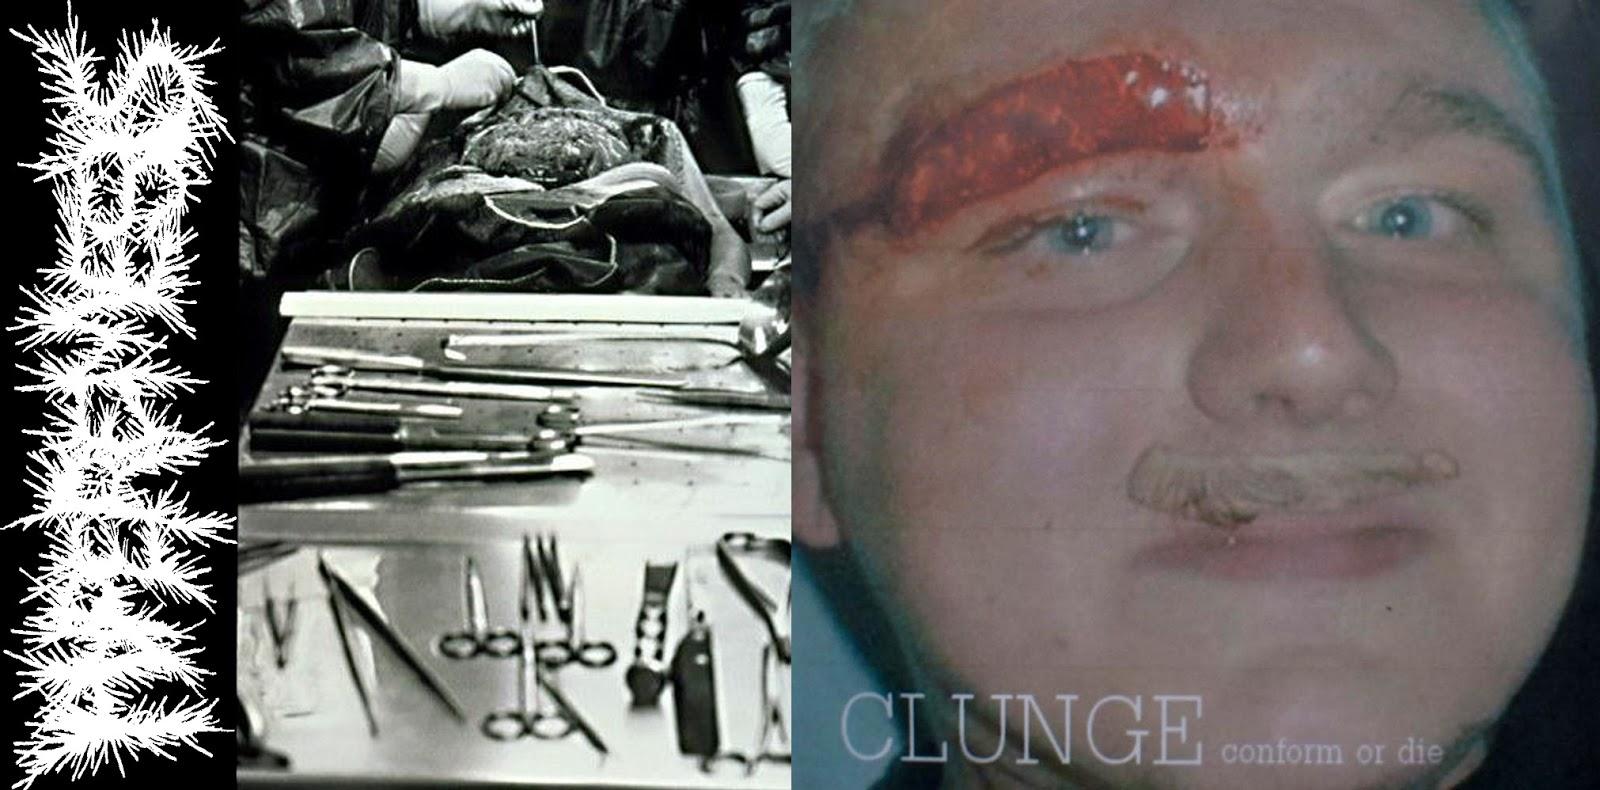 Hyperemesis & Clunge - Split (2012)